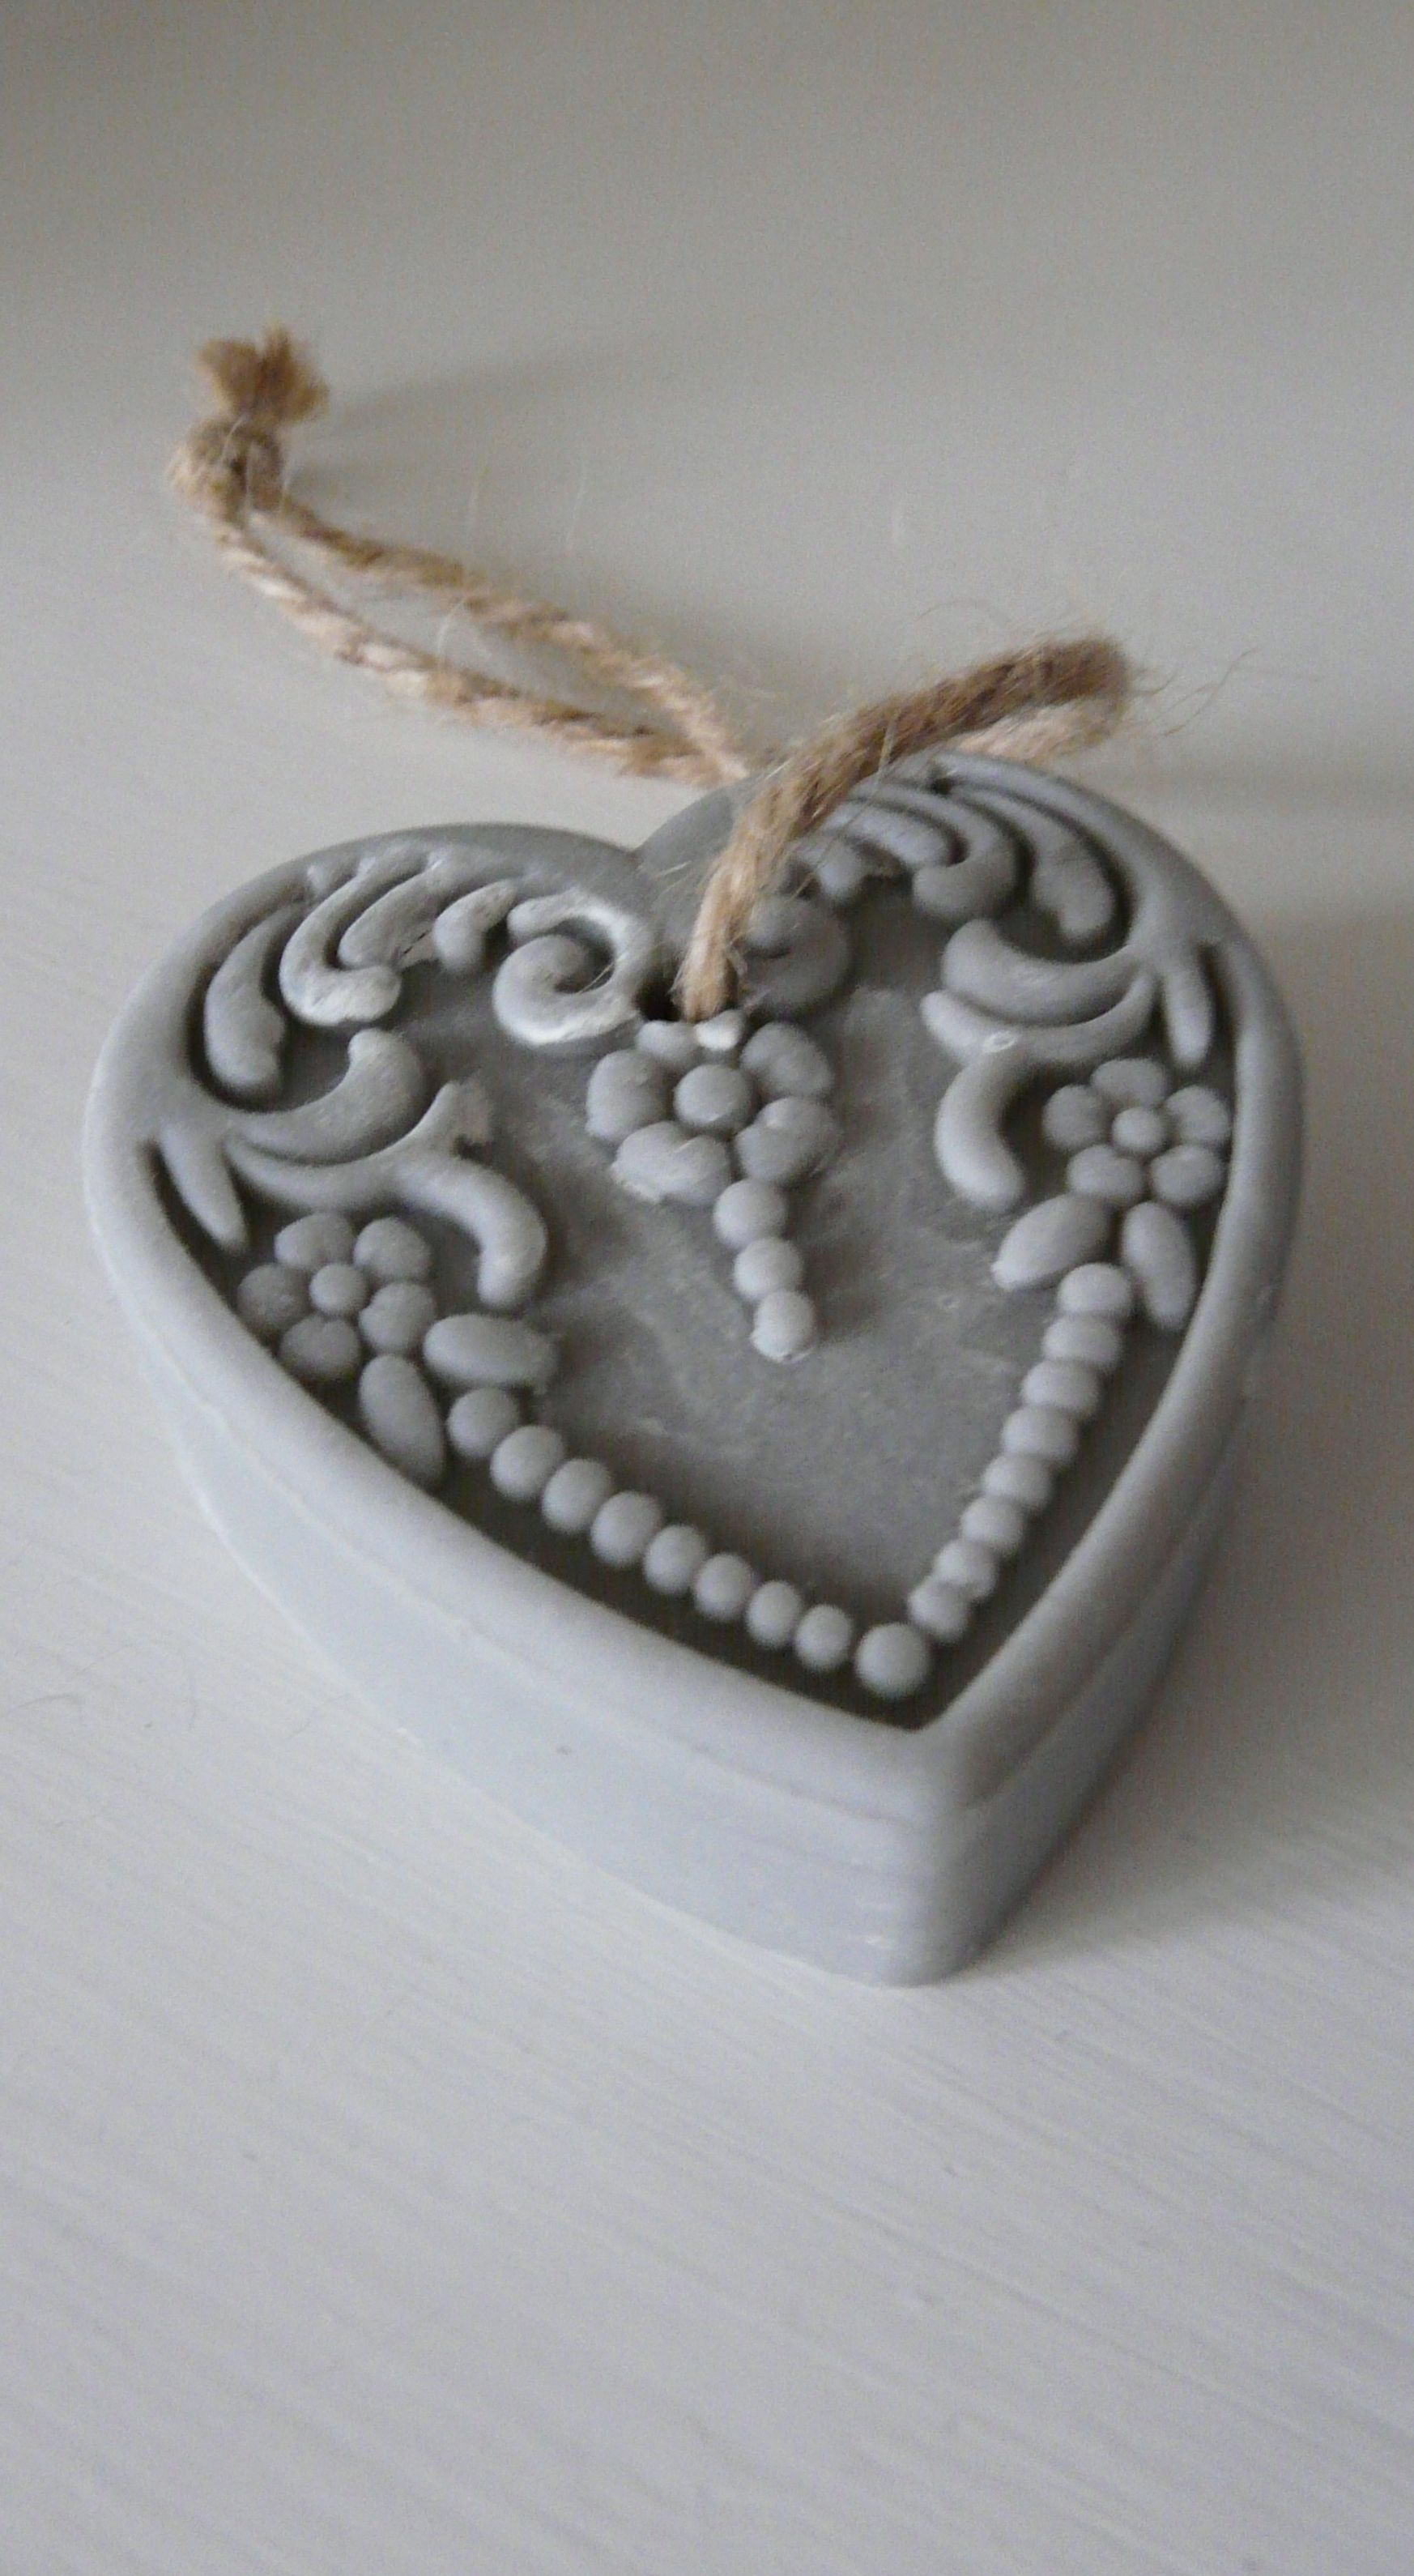 Pin by irishethka kalinina on soap pinterest purpose stone and rock